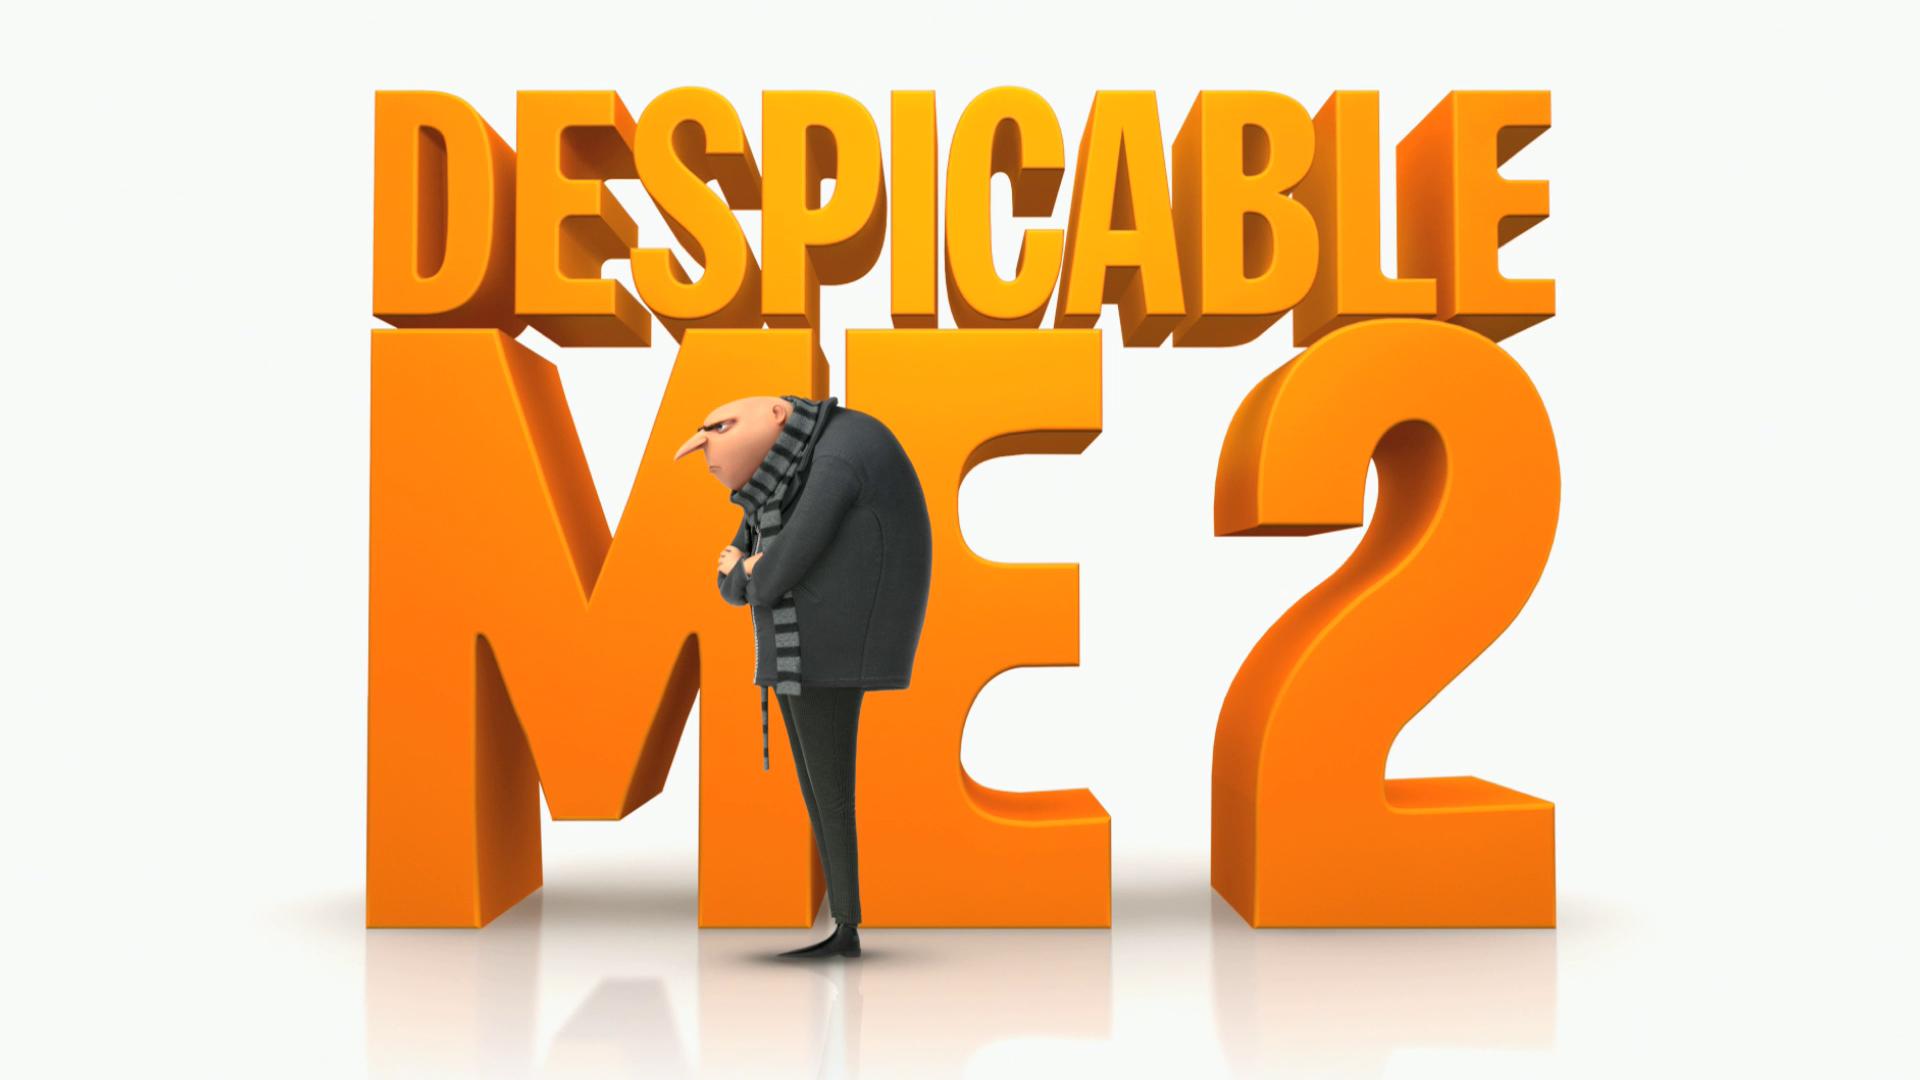 Despicable Me 2 [Official Movie Trailer]